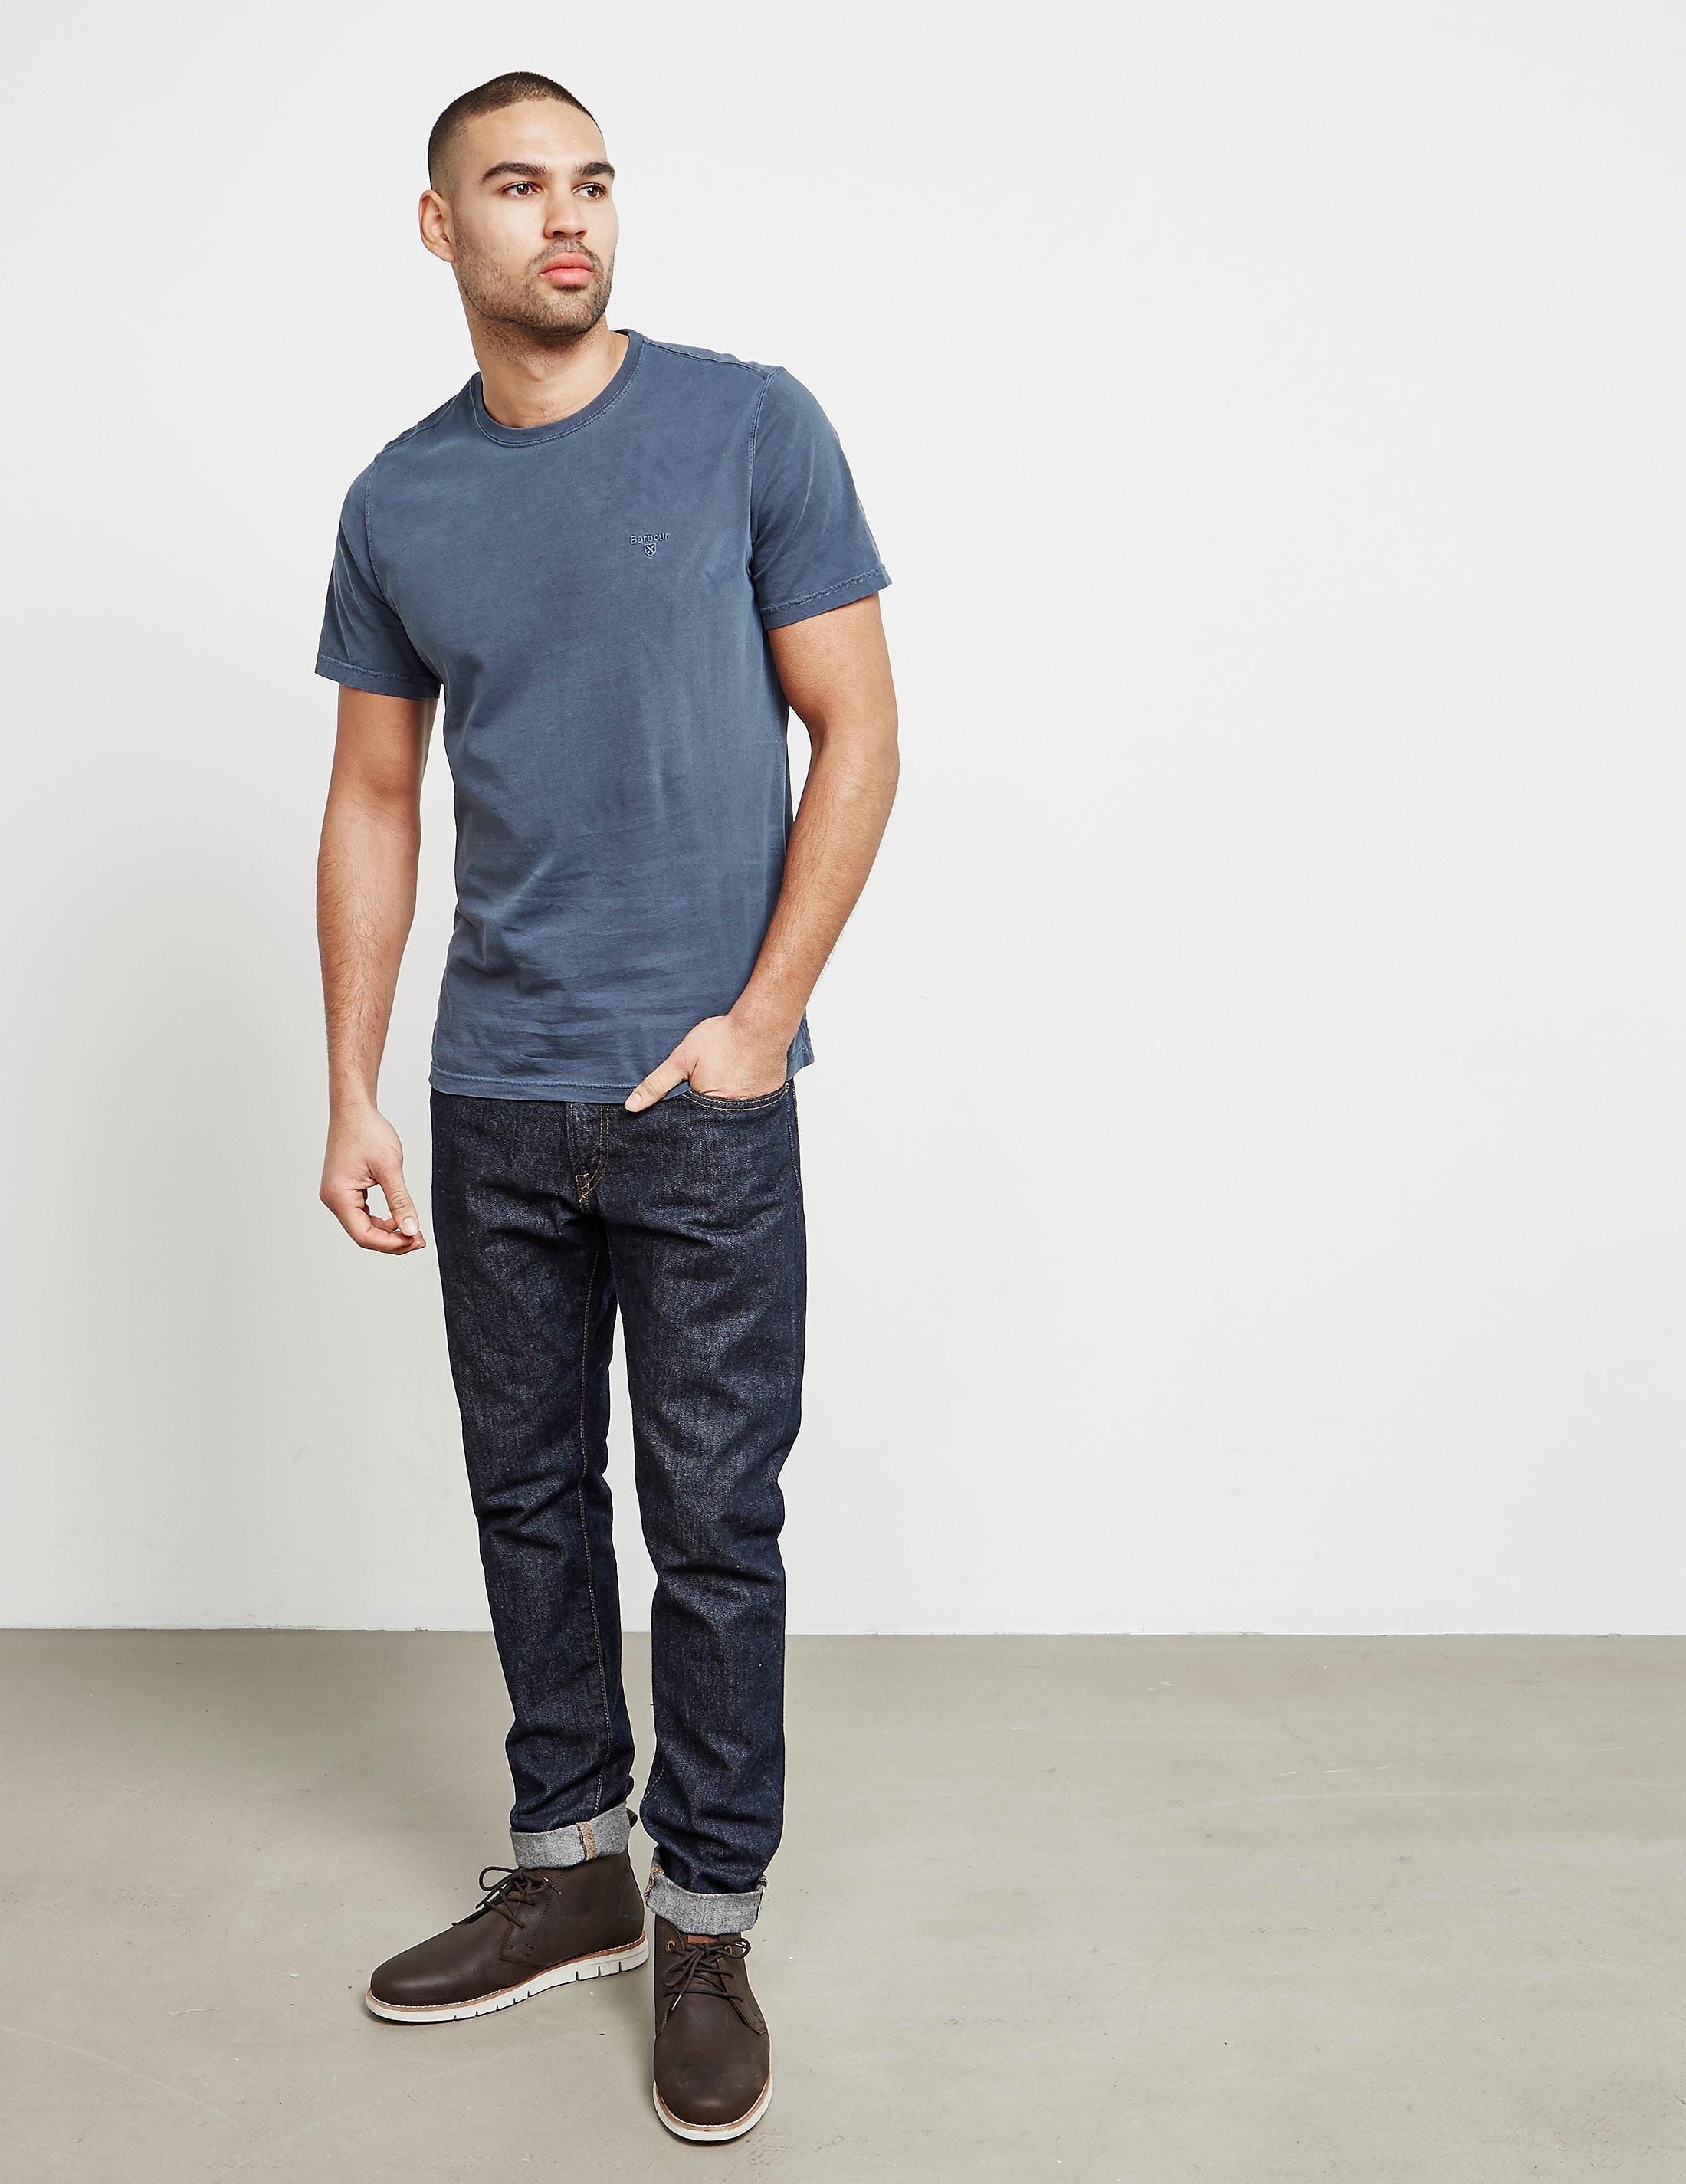 Barbour Garment Dyed Short Sleeve T-Shirt